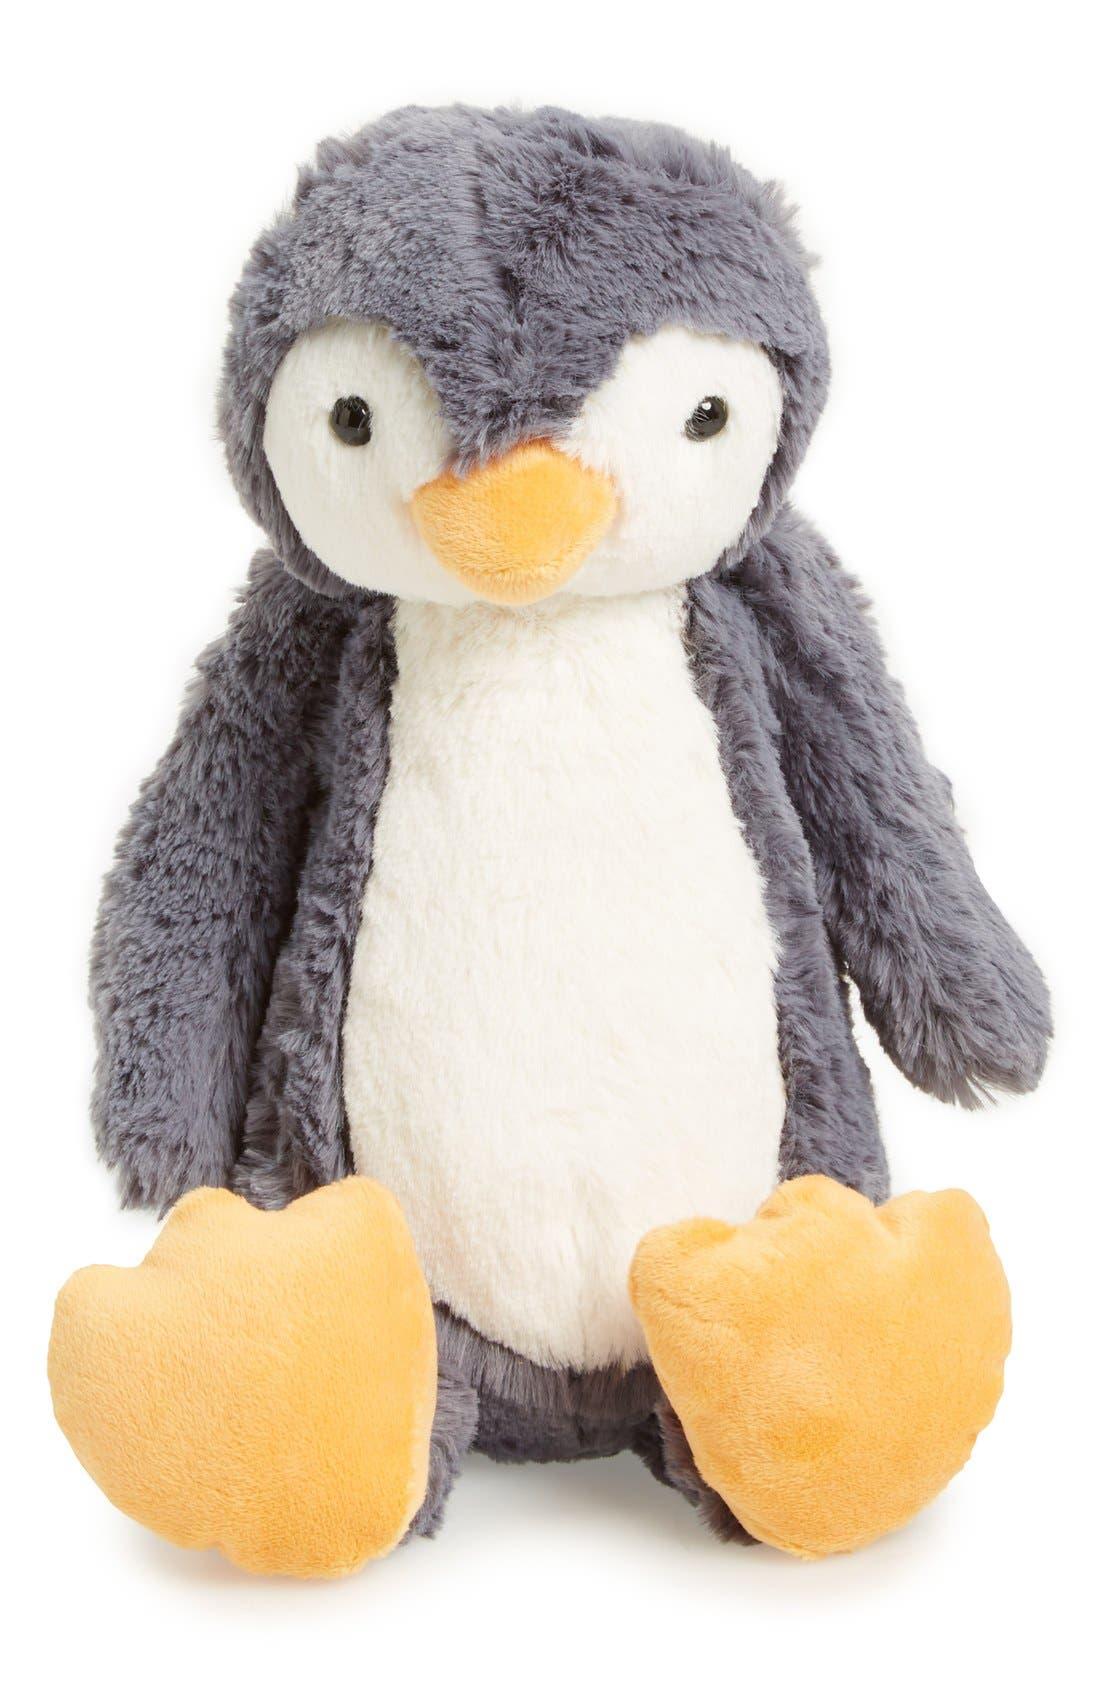 Jellycat Medium Bashful Penguin Stuffed Animal